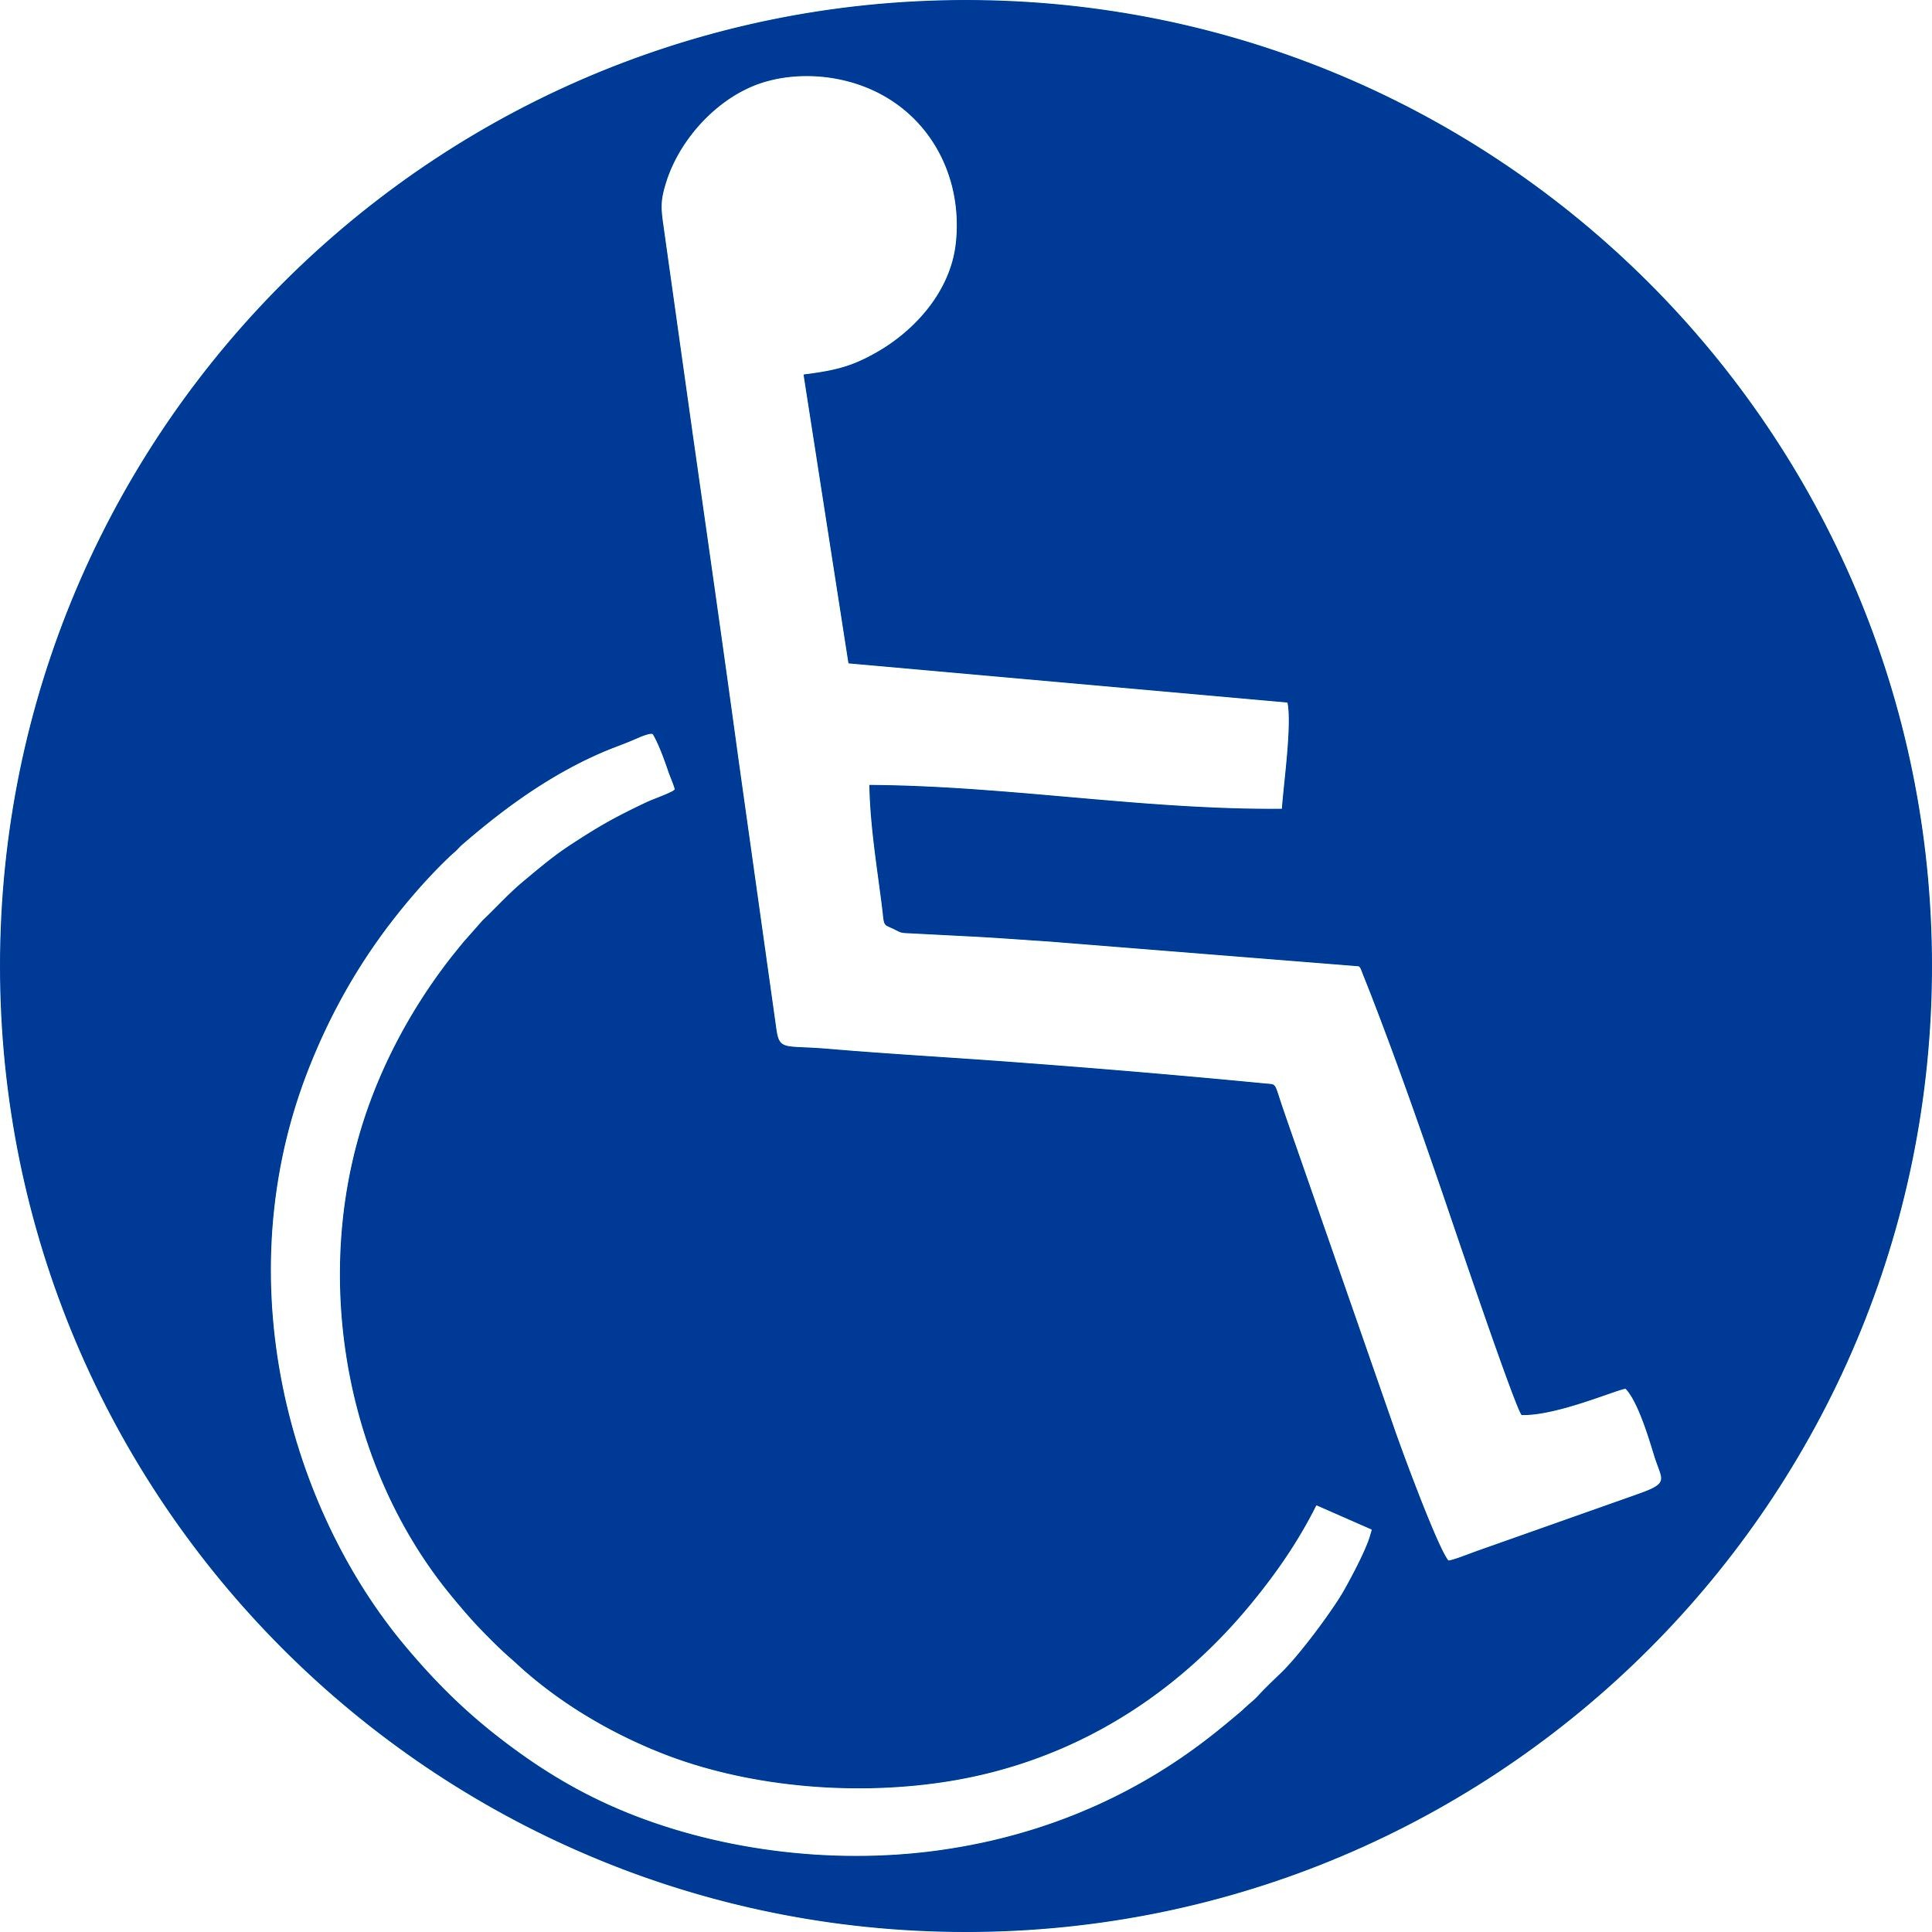 Sticker handicapped symbol dimension 60 x 60 mm